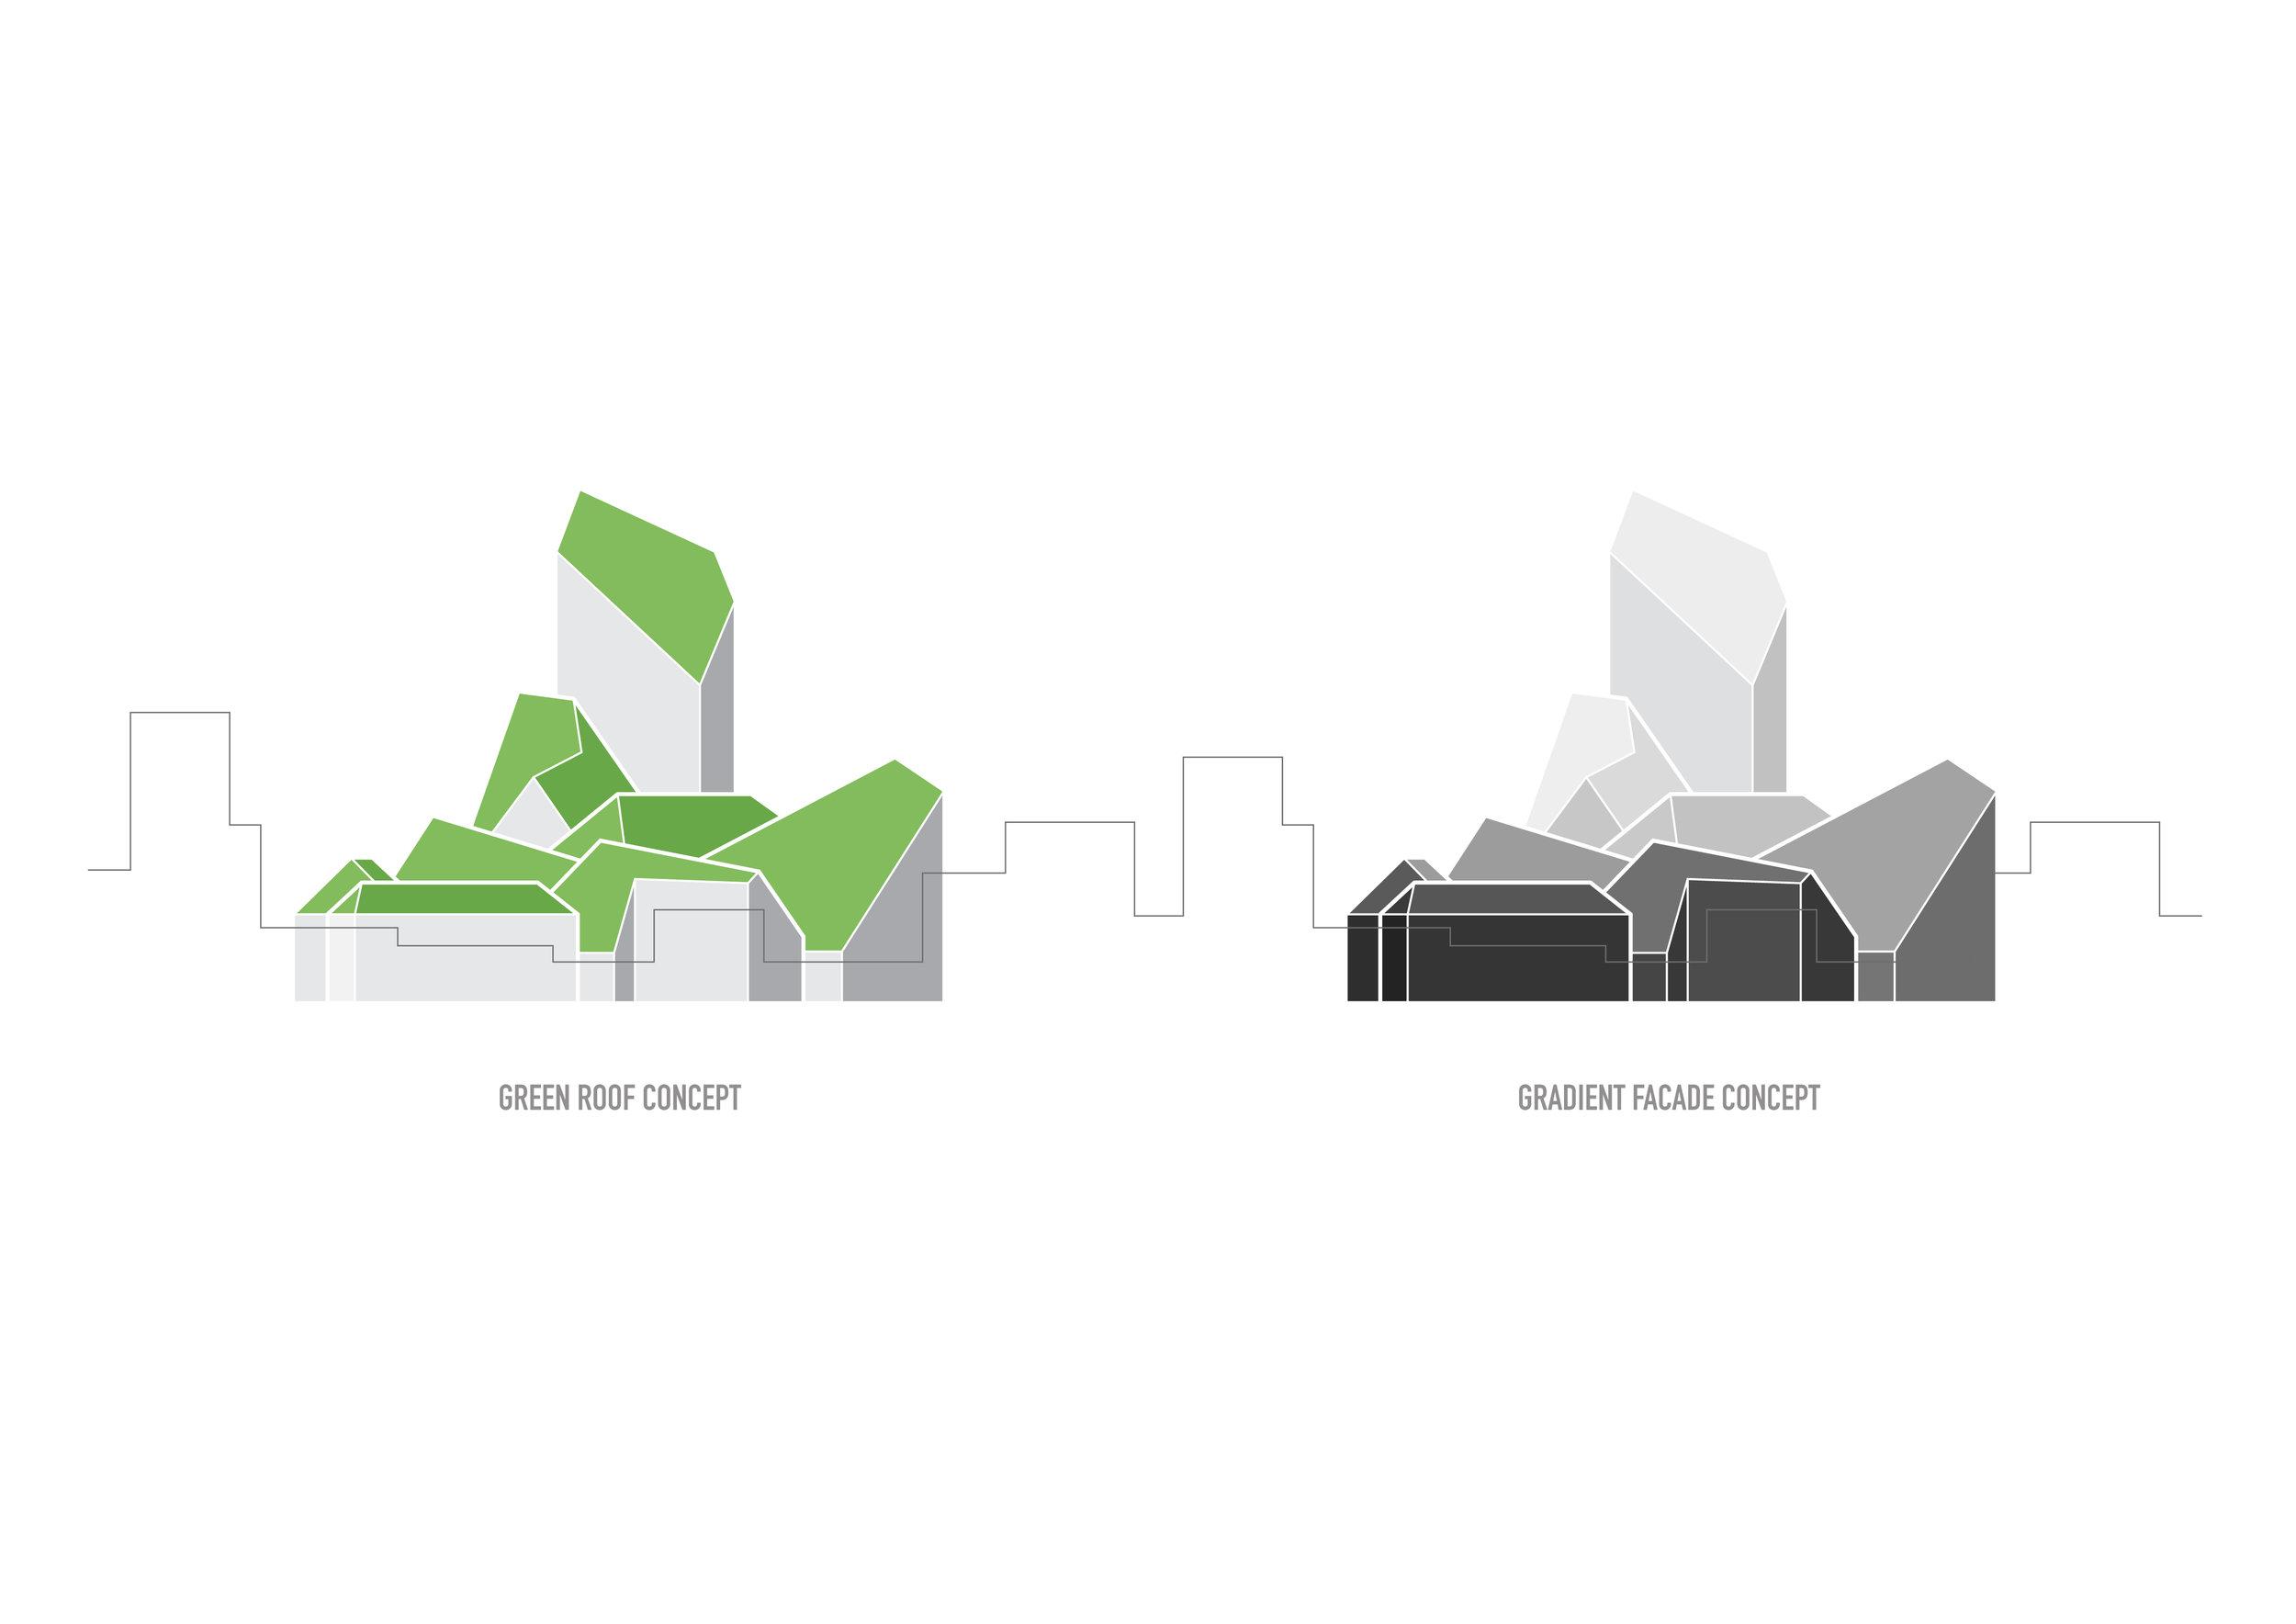 MVRDV_Nieuw Bergen_buildings concept_copywright MVRDV.jpg